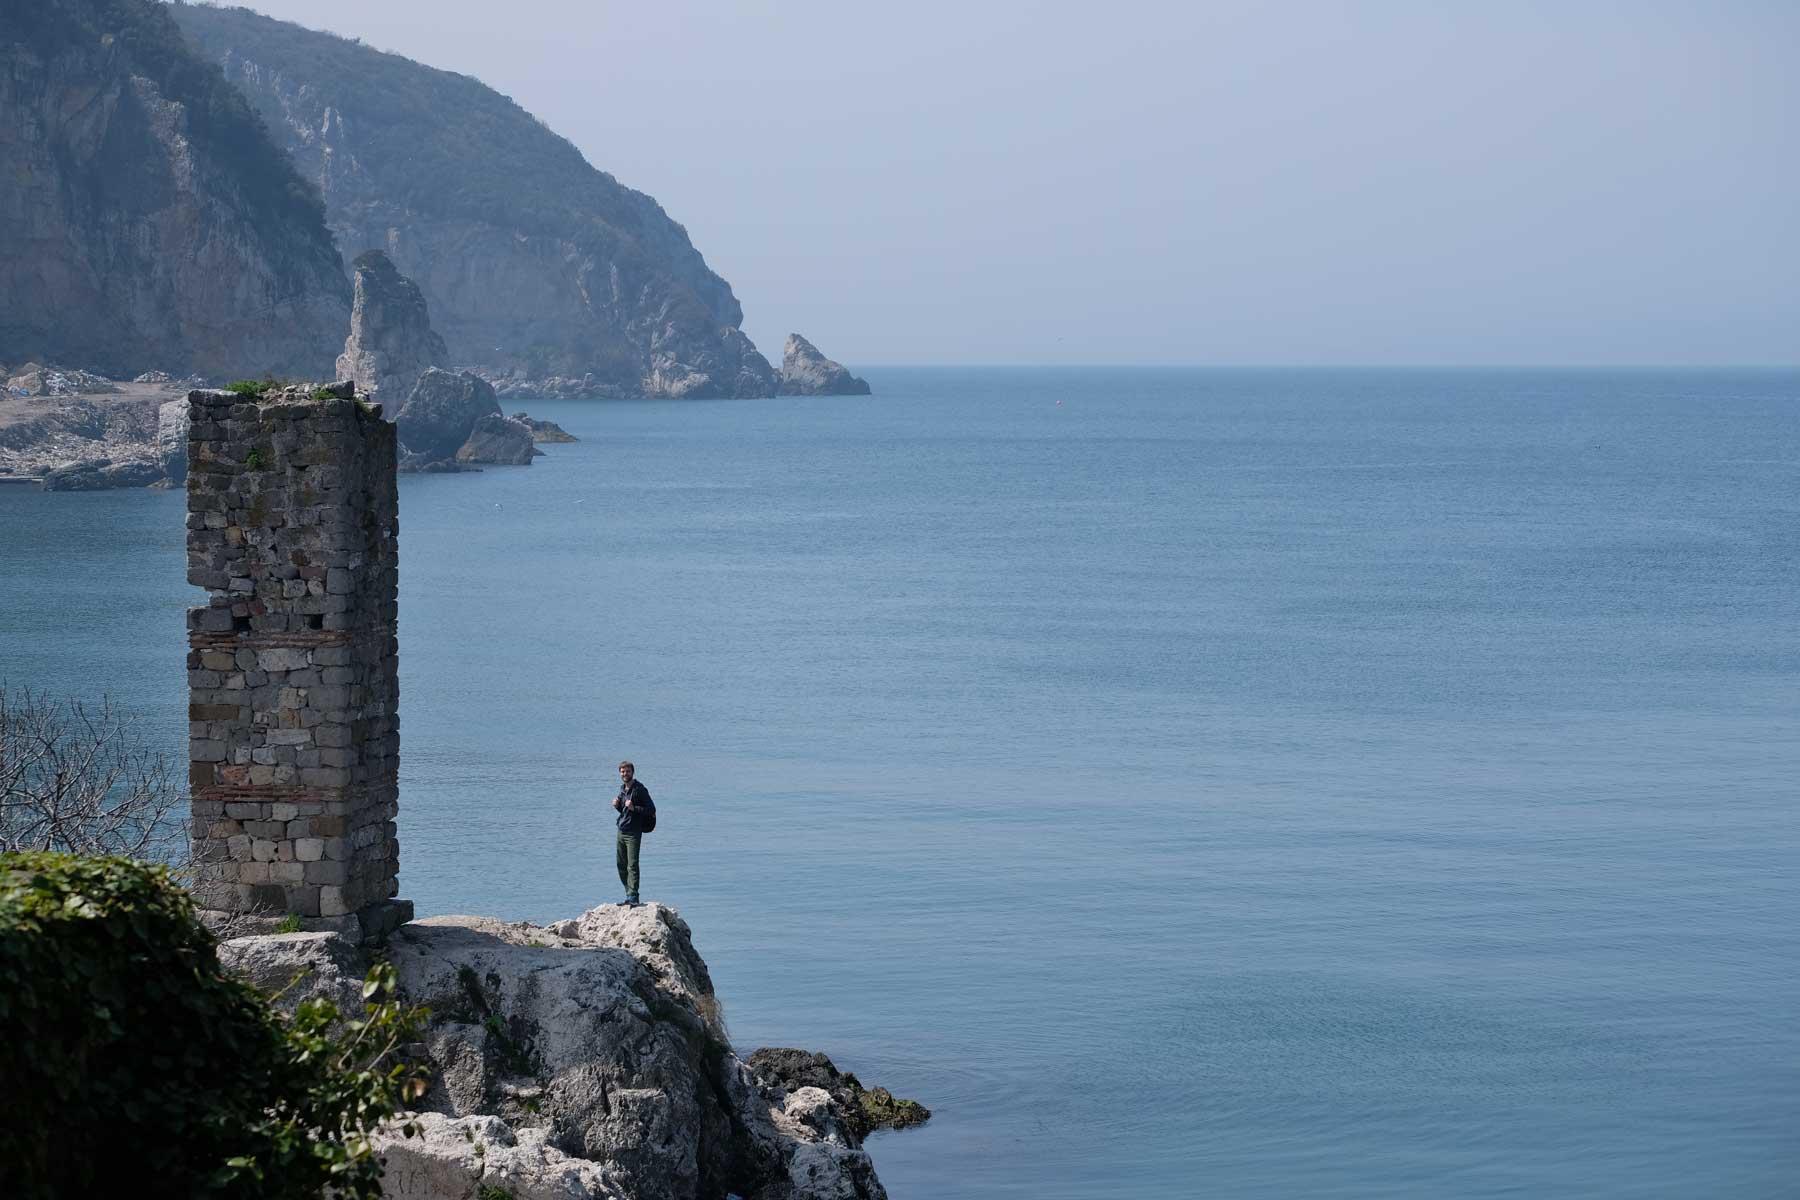 Sebastian neben einem Steinturm am Ufer